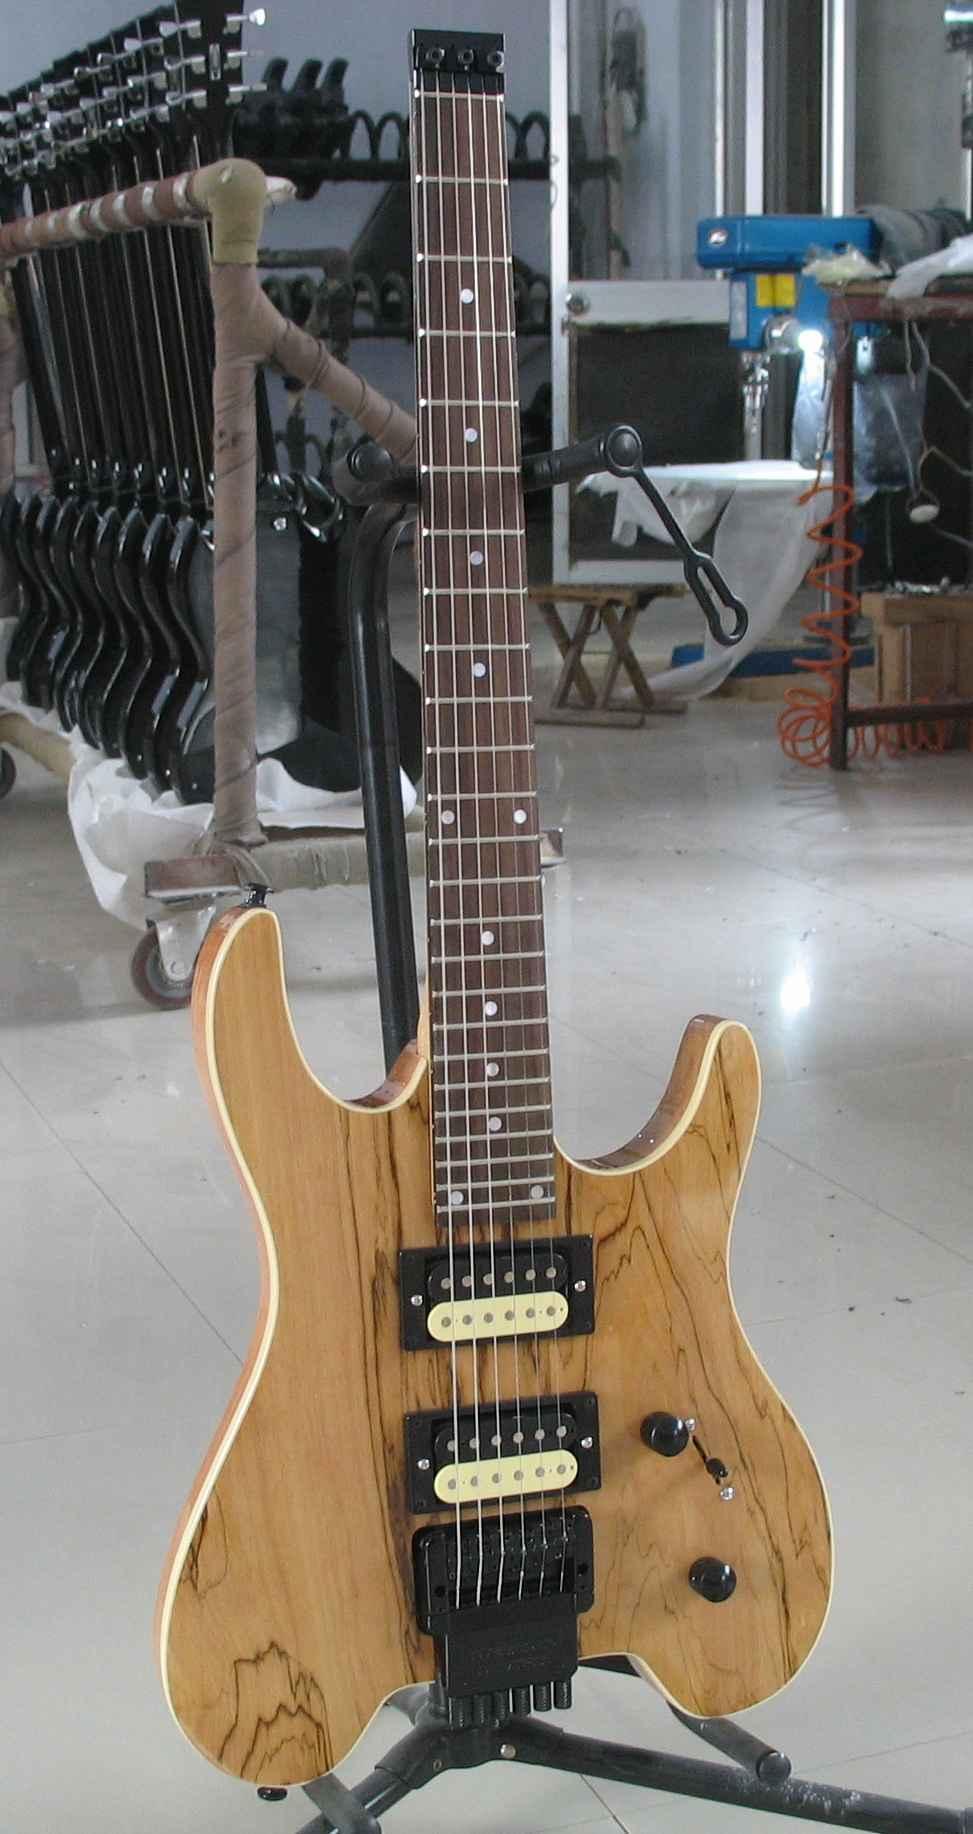 2020 Jingying Music Hot Sale Headless Electric Guitars 7